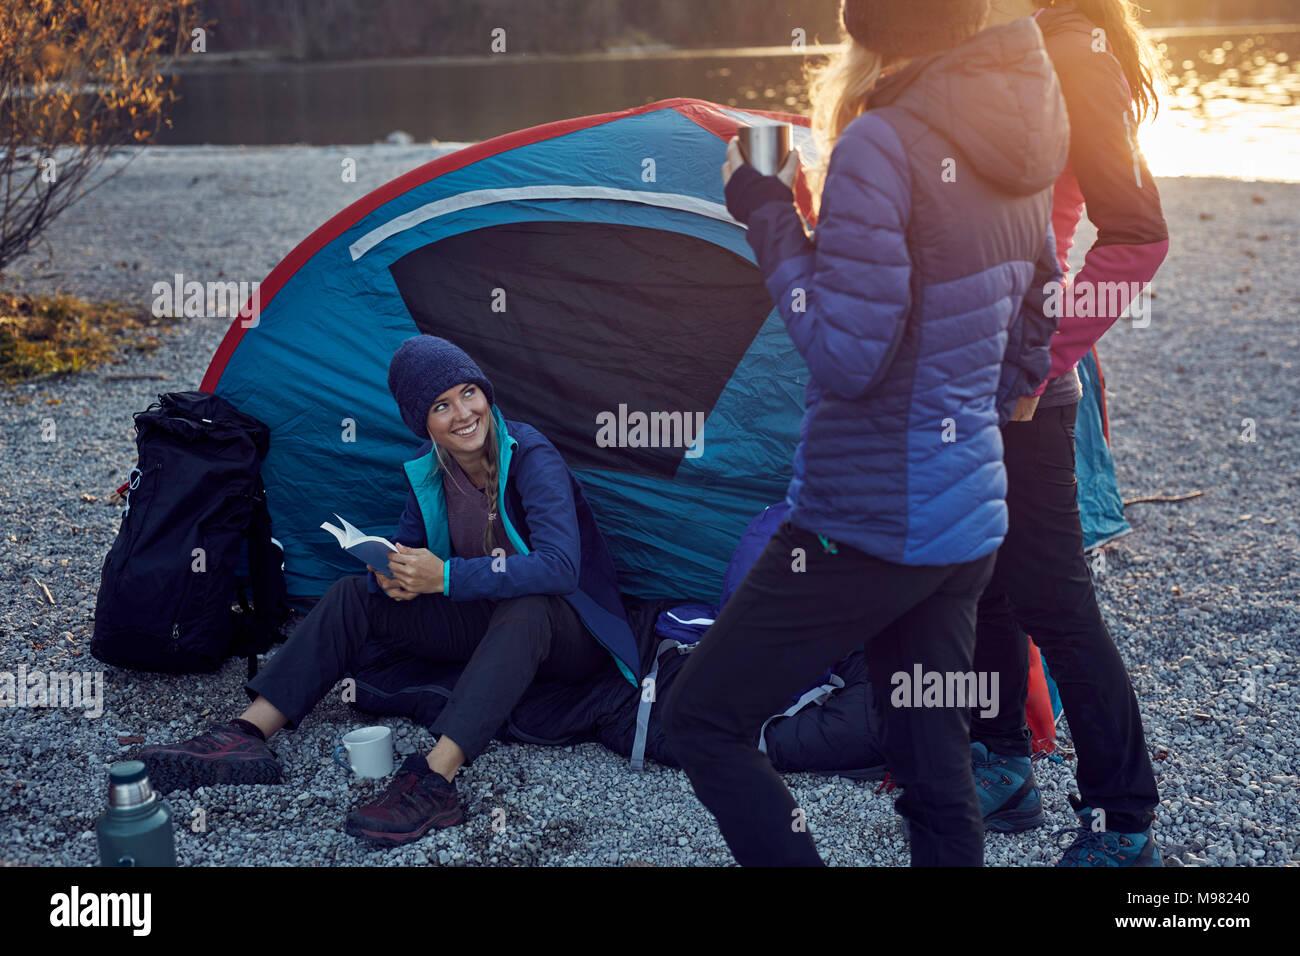 Group of hikers camping at lakeshore at sunset - Stock Image